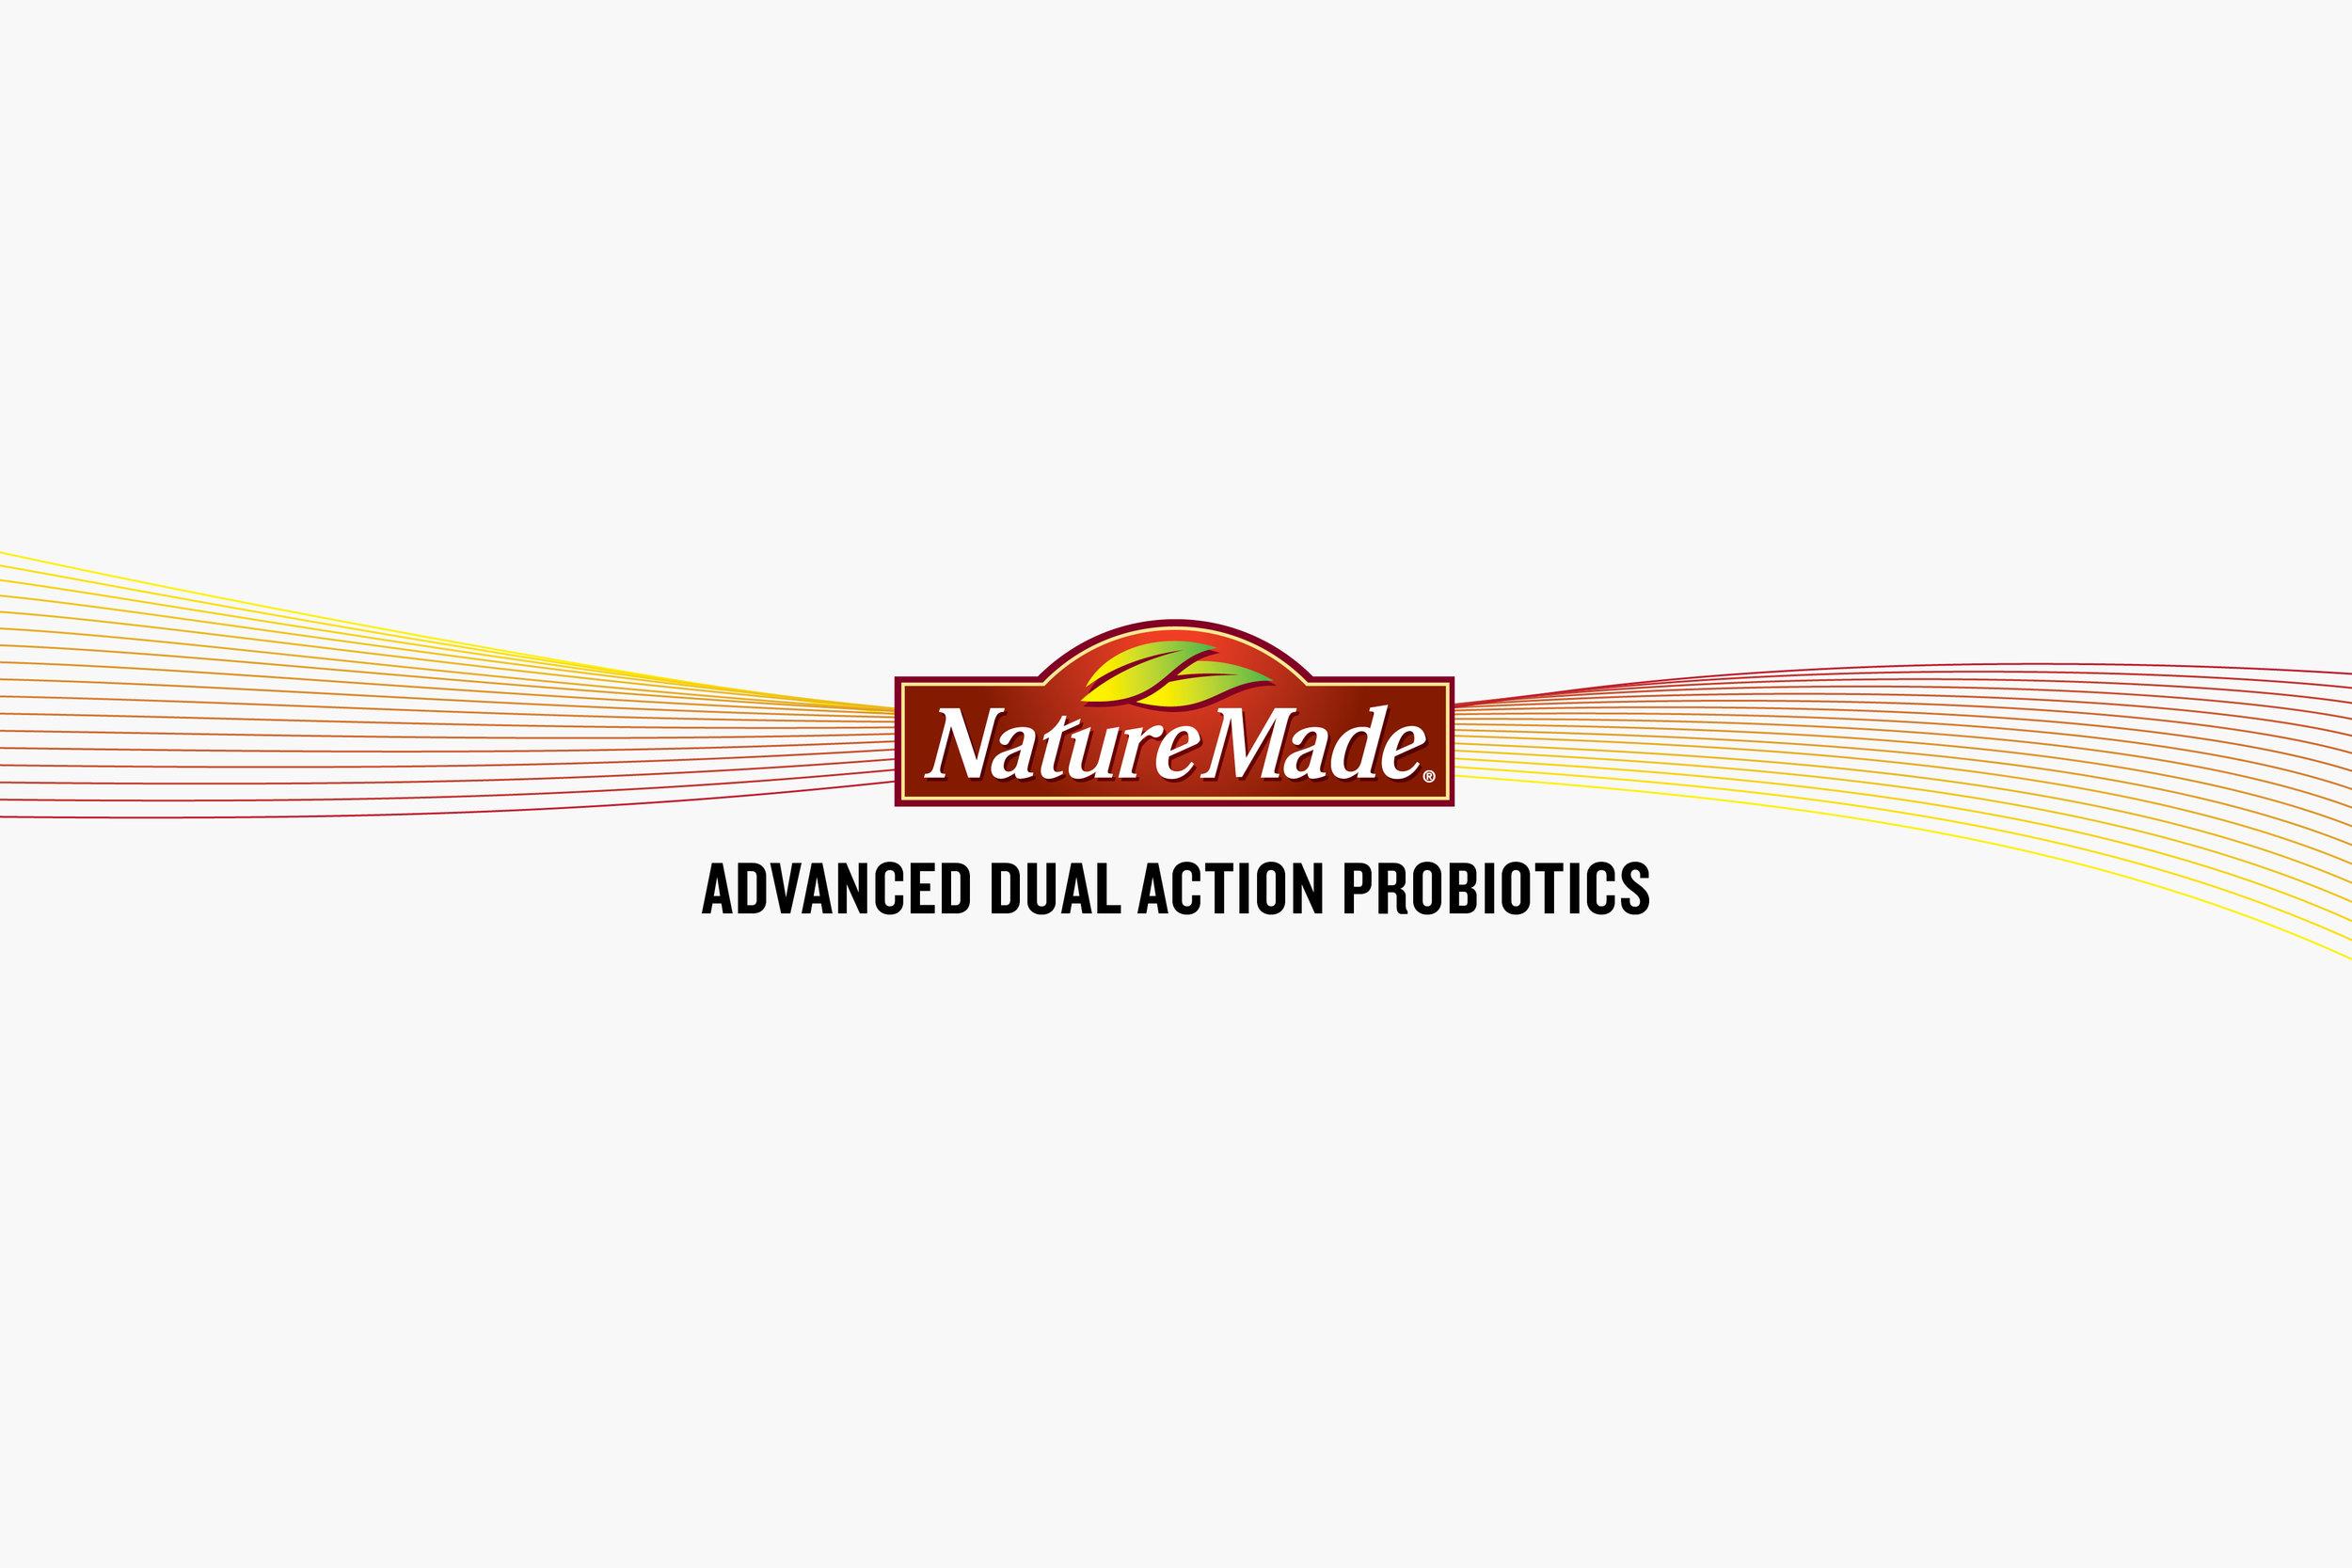 Nature-Made-Probiotics-1.jpg